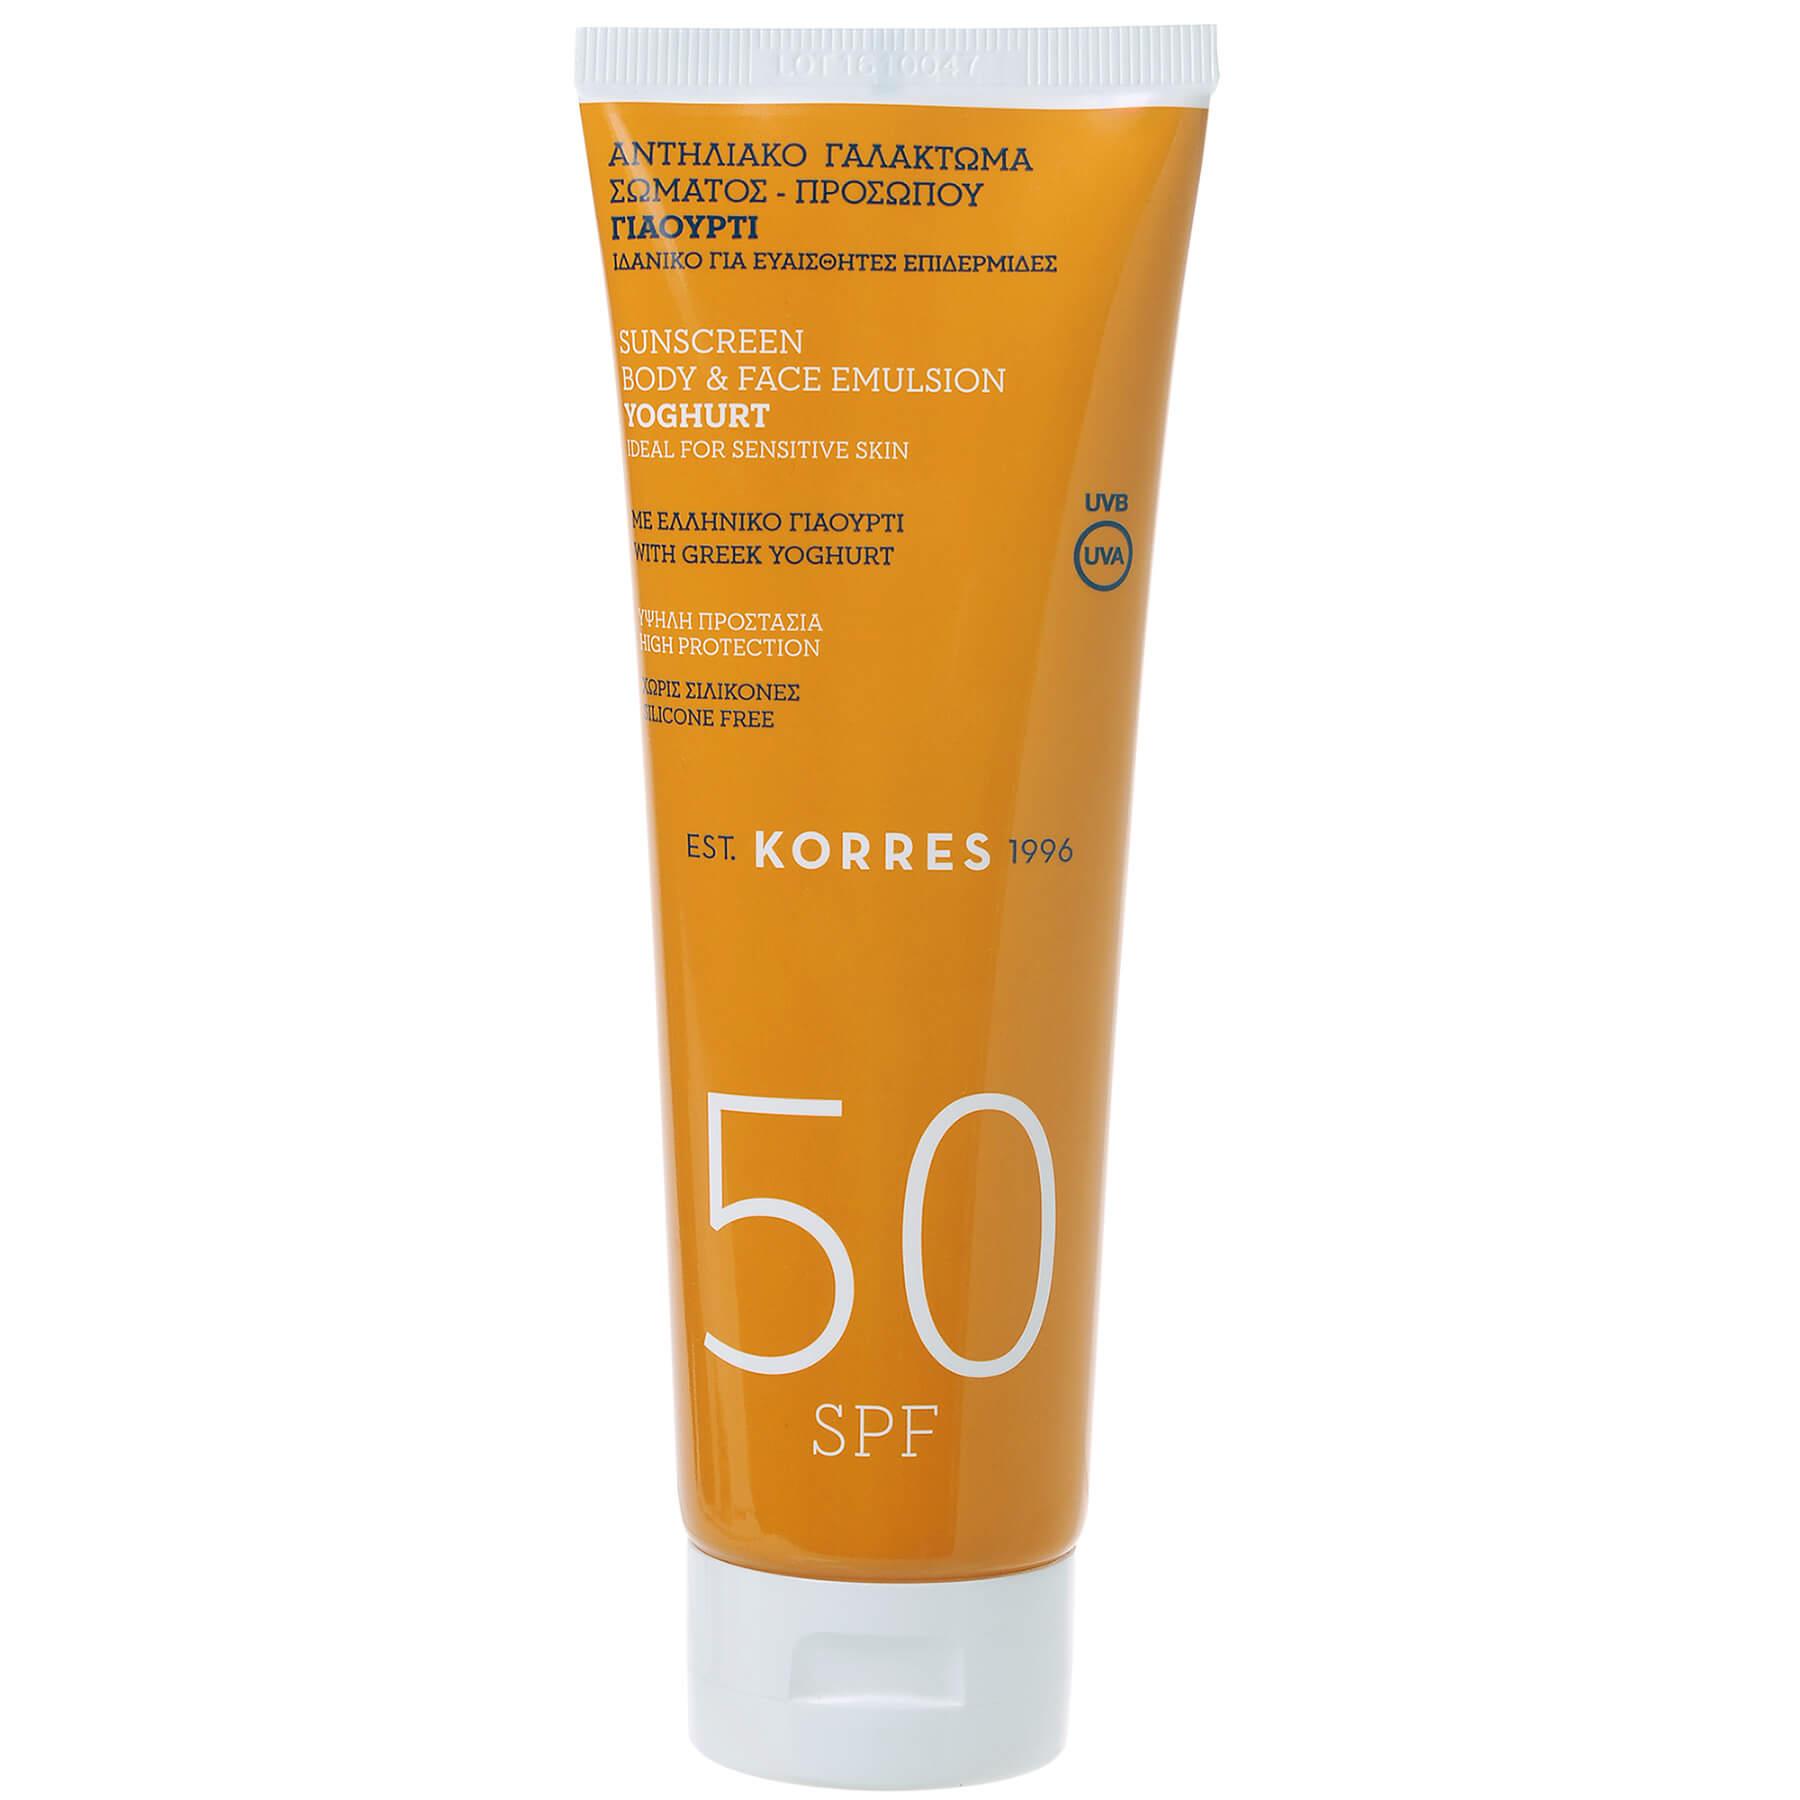 Korres Yoghurt Sunscreen Body & Face Emulsion Spf50 Αντηλιακό Γαλάκτωμα Προσώπου Σώματος Γιαούρτι 250ml